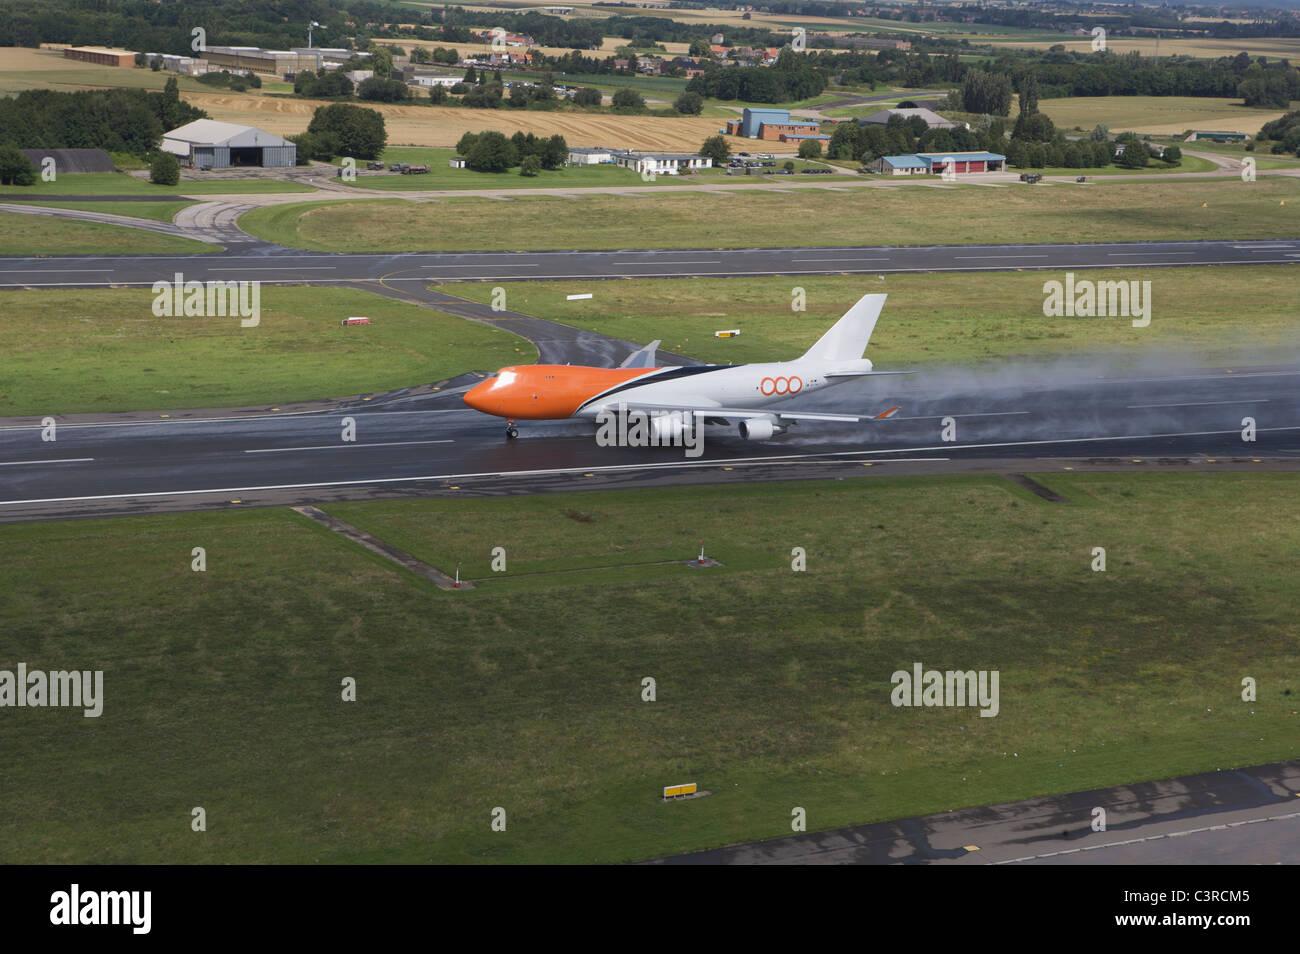 Plane taking off - Stock Image